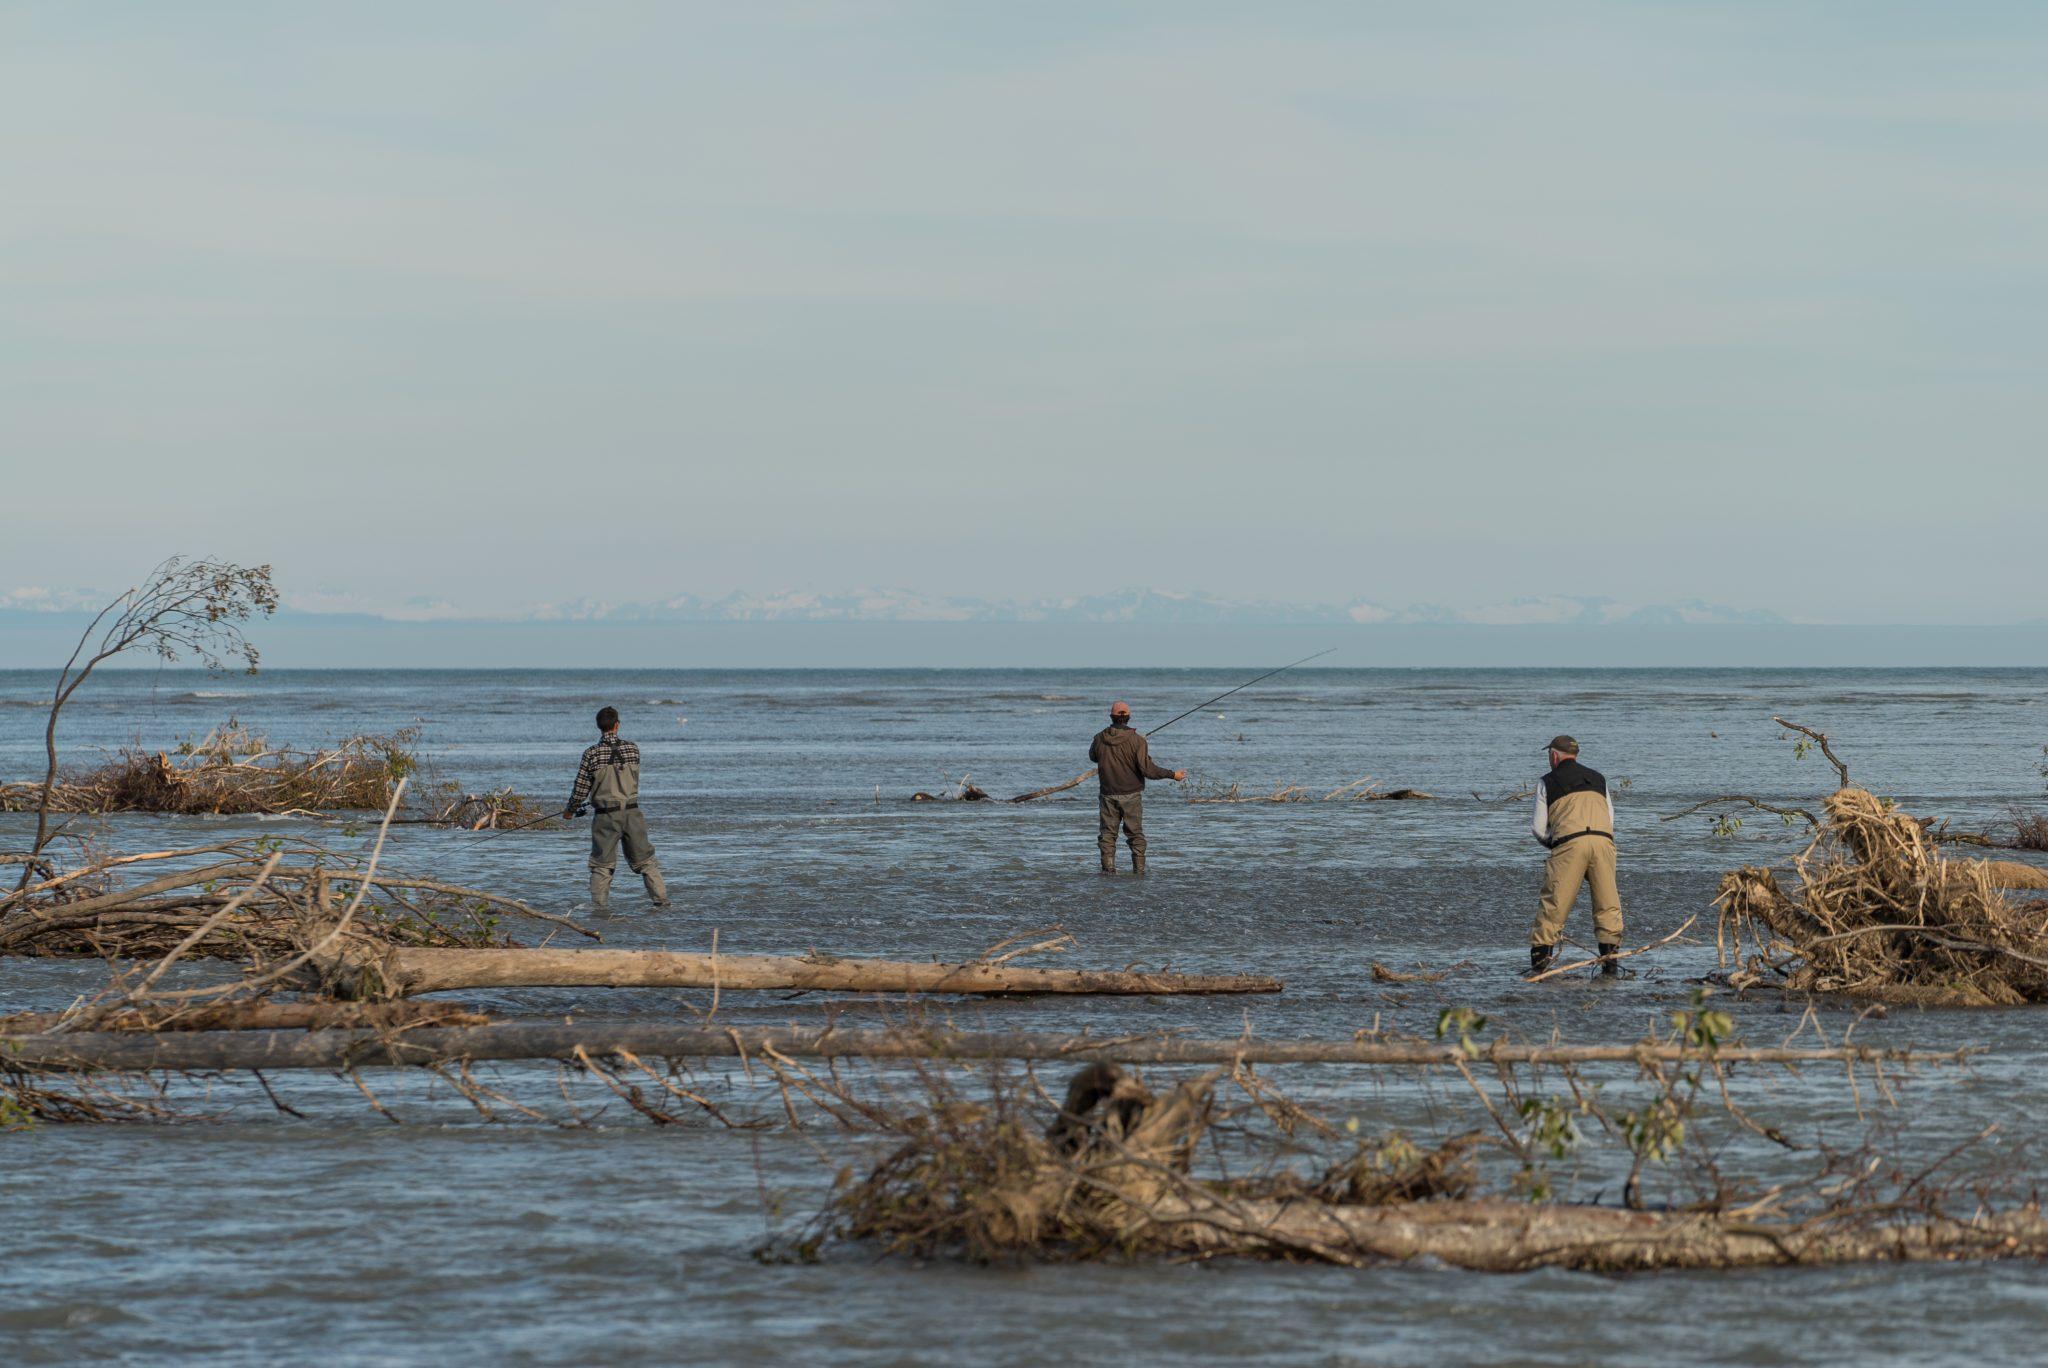 alaska-crescent-river-vacation-fishing-salmon-snug-harbor-DSC06873